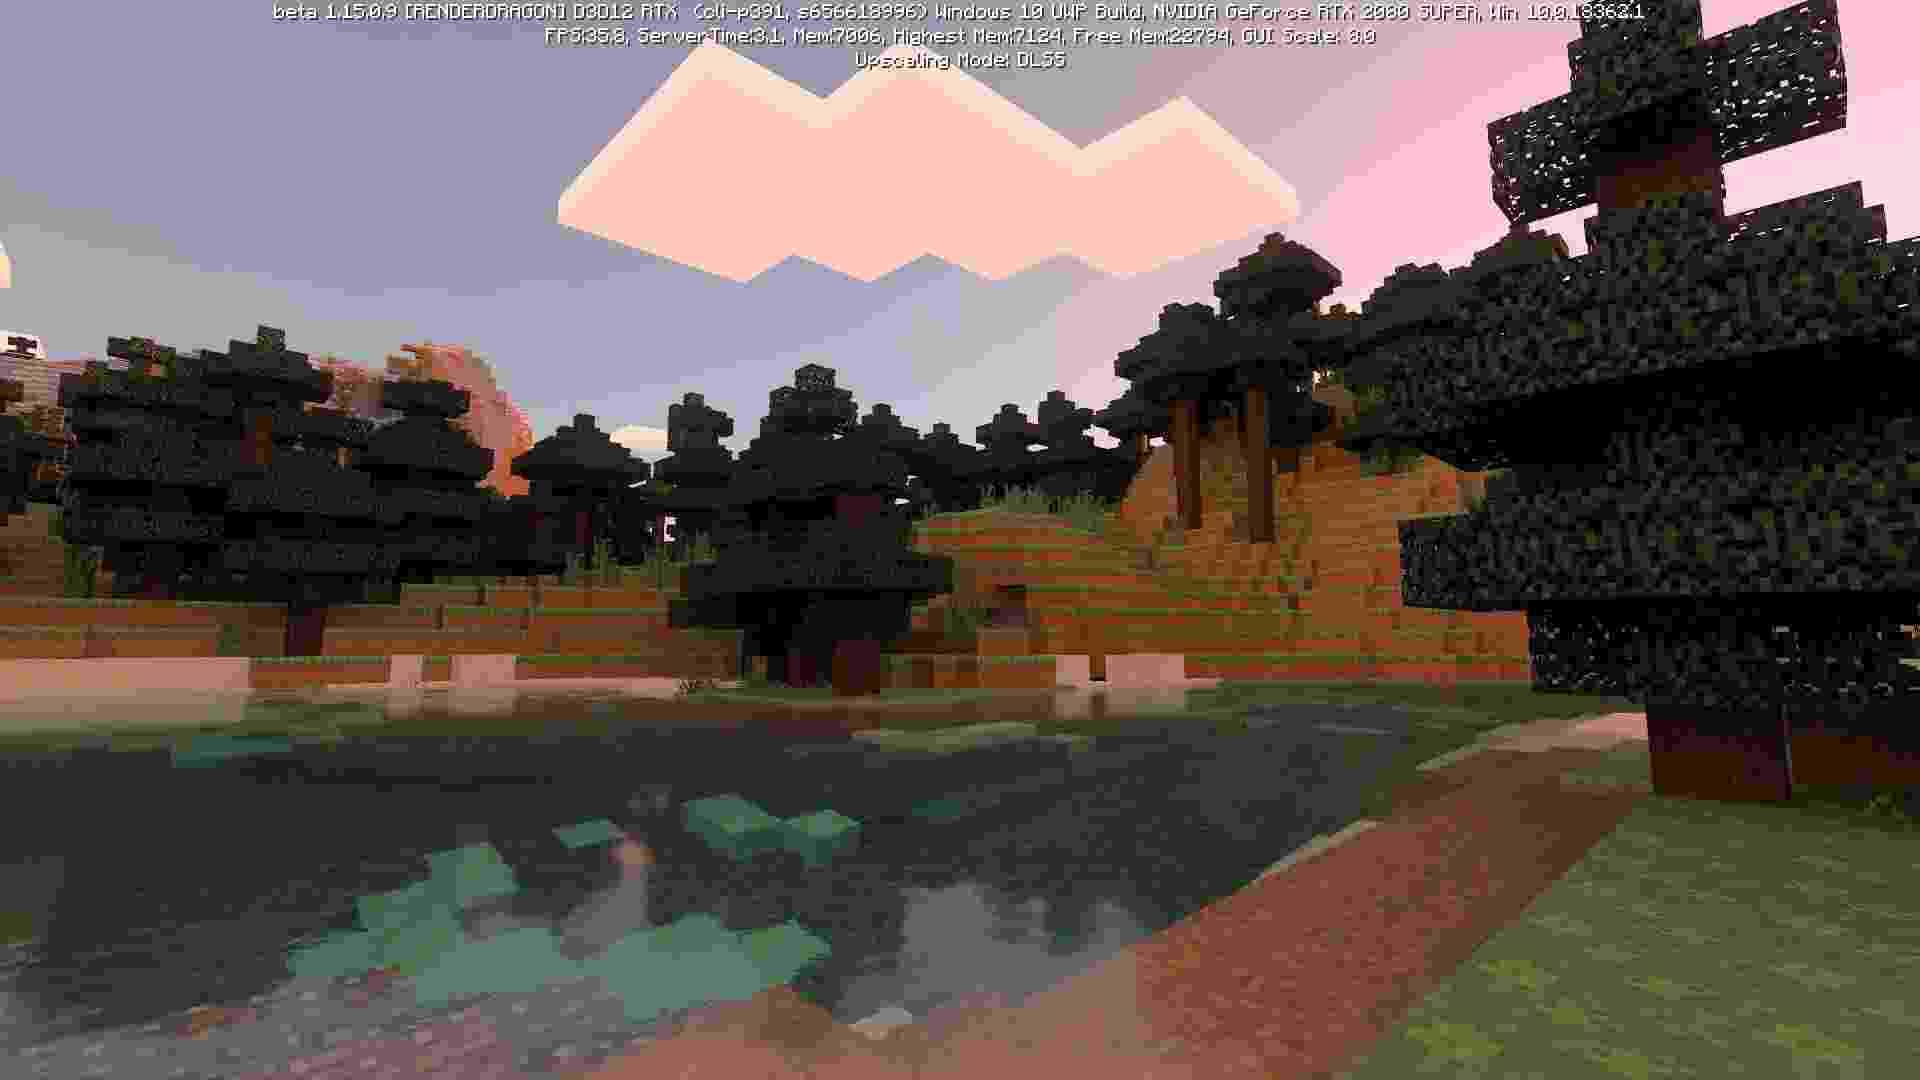 Minecraft com Ray Tracing - Sammy Anderson/GameHall